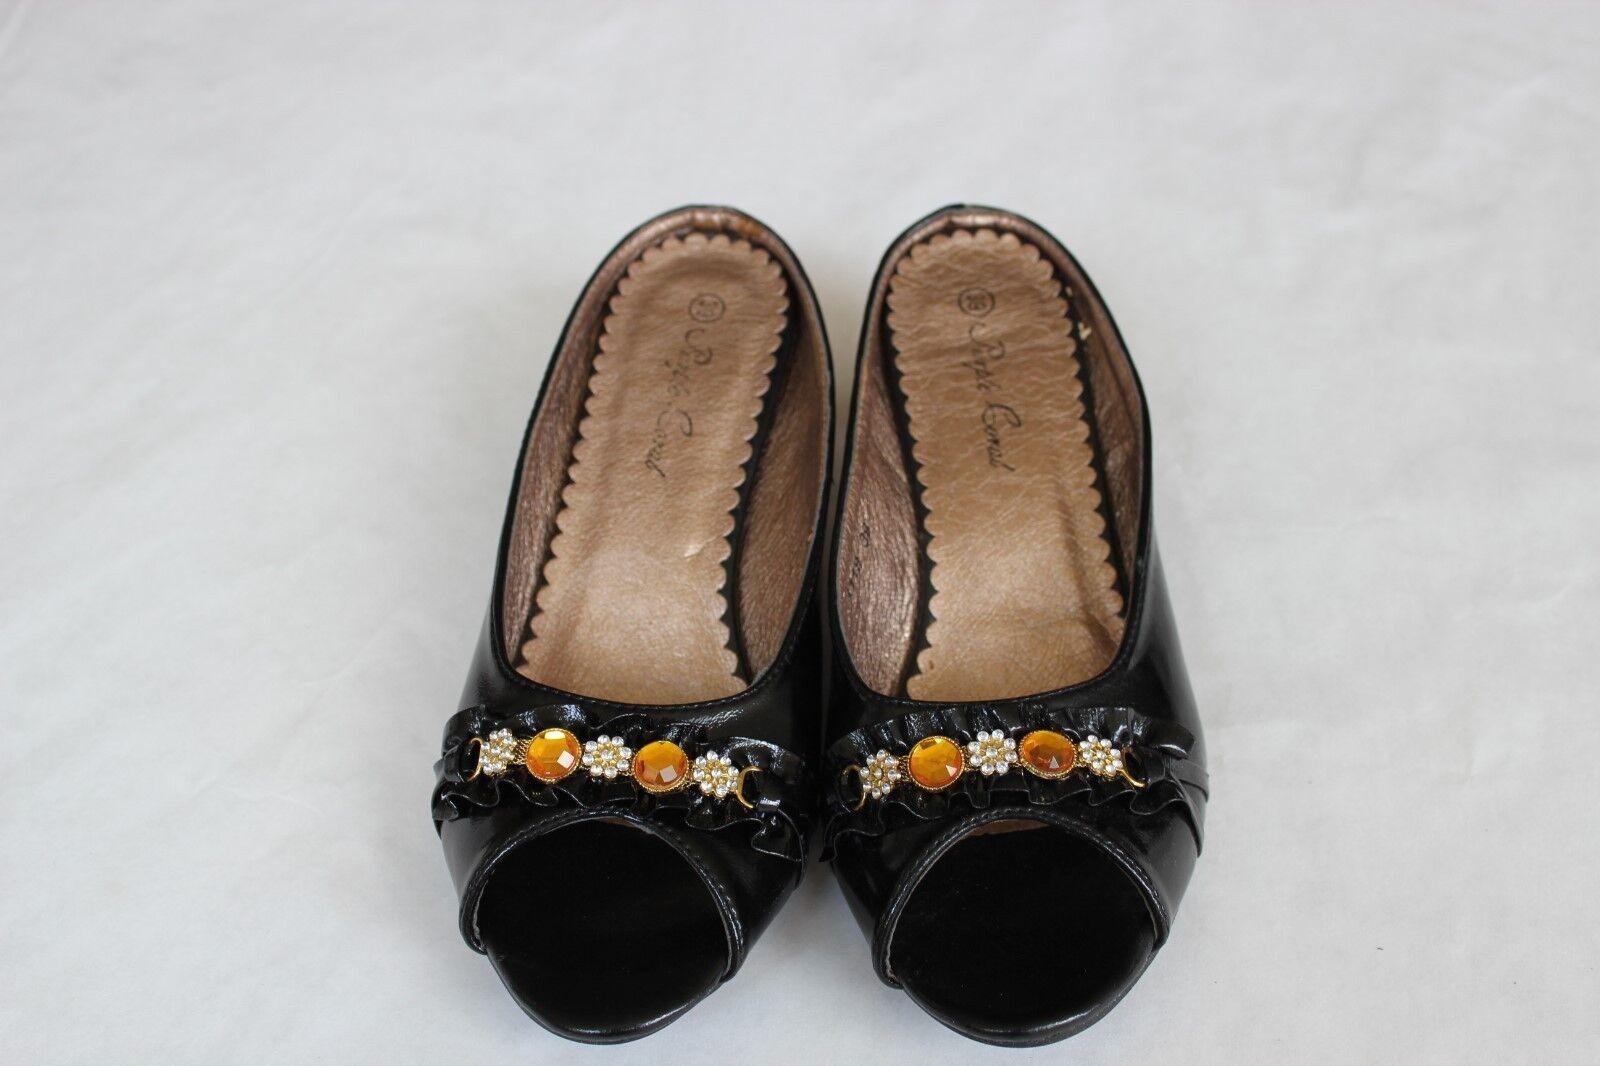 NIB Lady shoes Black Heels Color E23118  Low Heels Black with Buttons   Size 7 d6335e